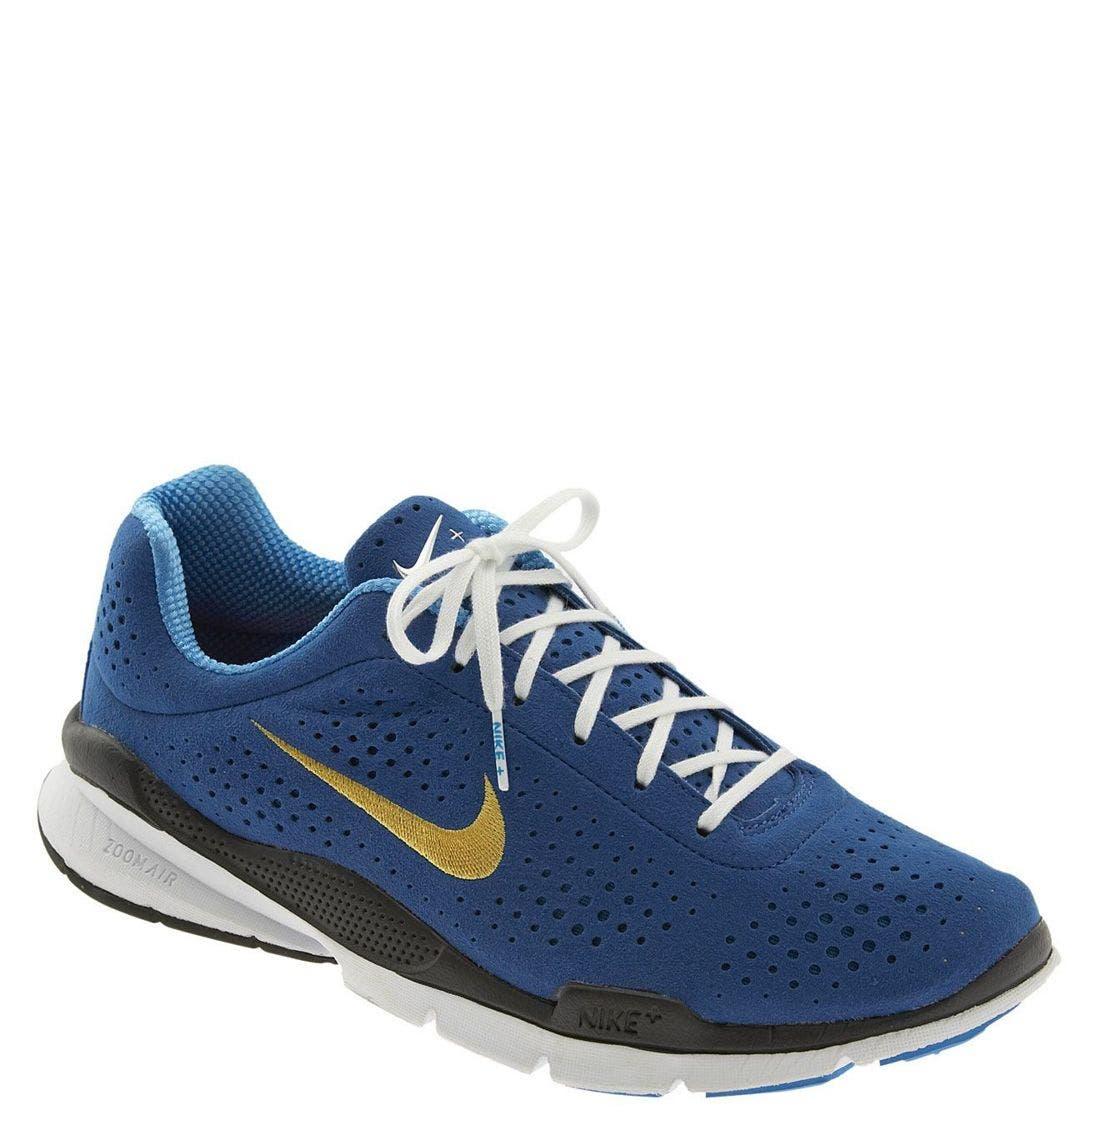 NIKE,                              'Air Zoom Moire' Athletic Shoe,                             Main thumbnail 1, color,                             ASF